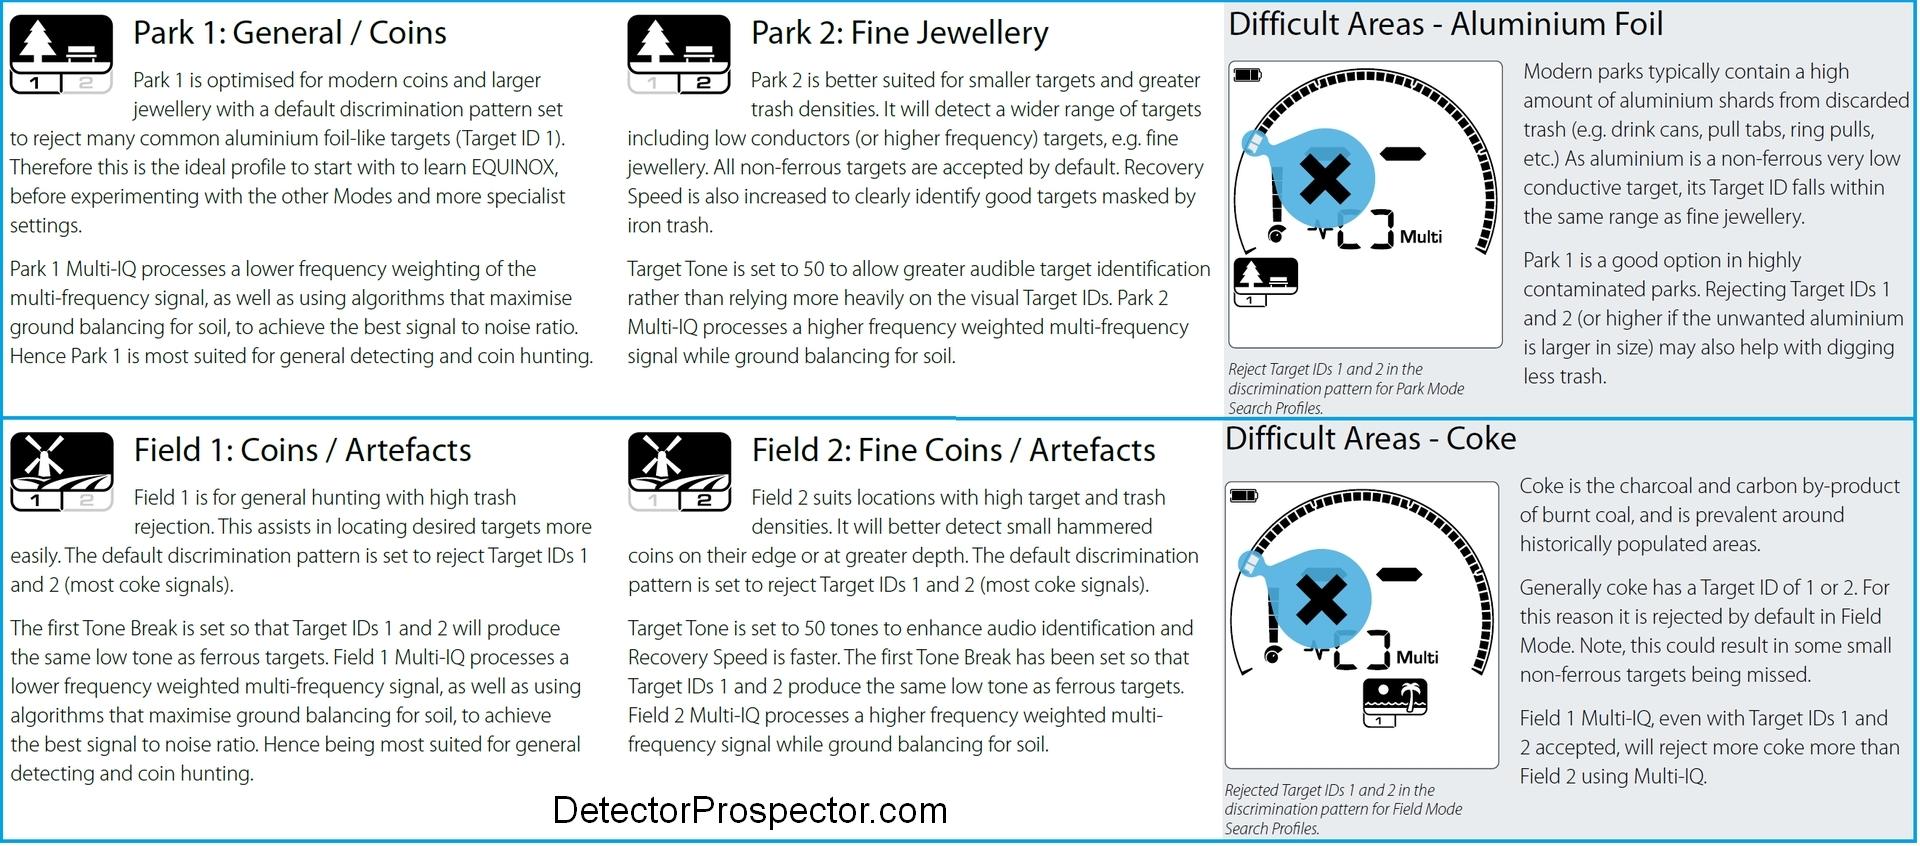 minelab-equinox-park-field-search-profiles-detail.jpg